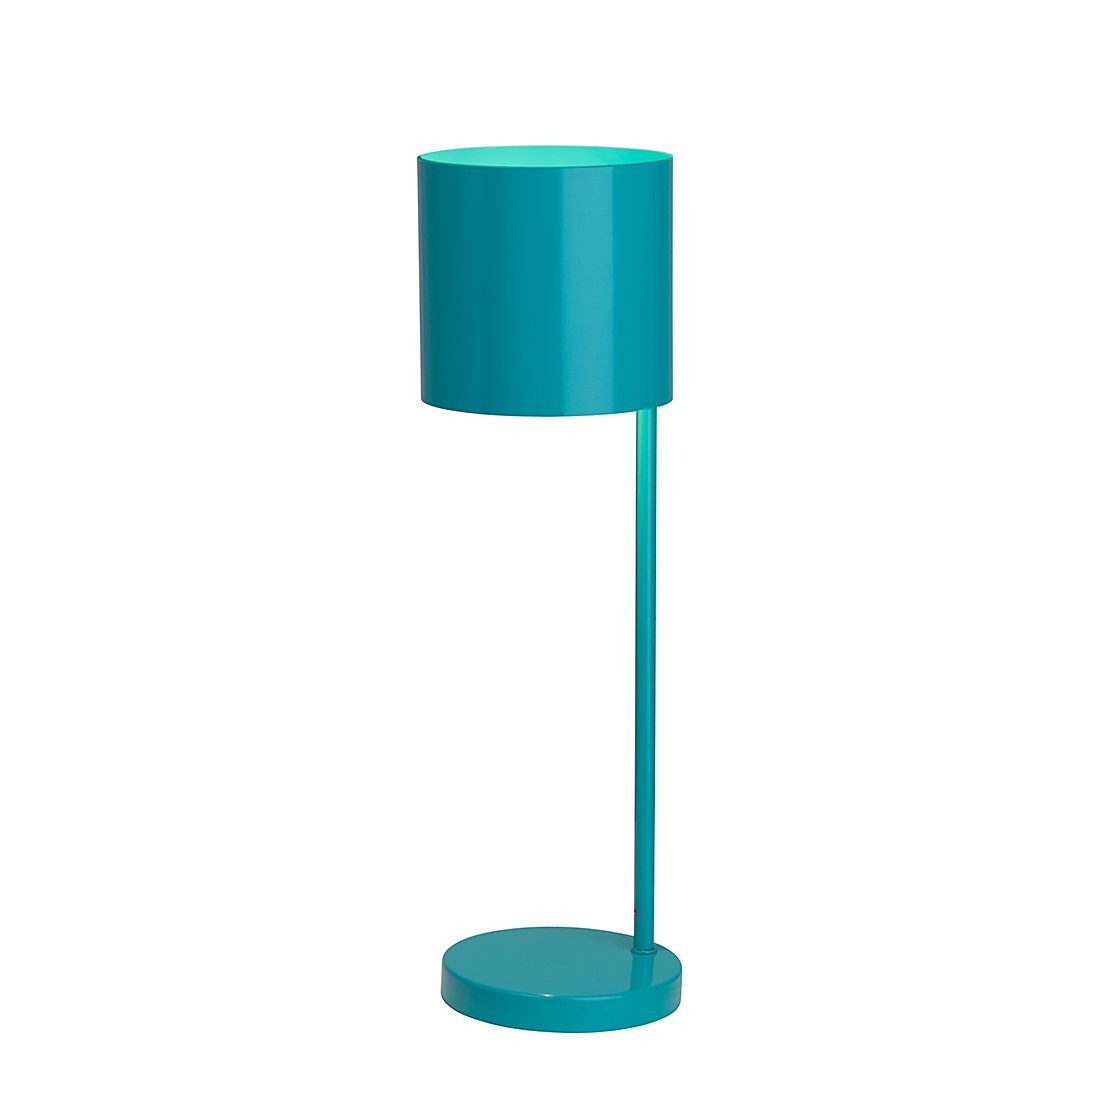 EEK A++, Tisch- & Standleuchten Sally – Metall/Metall – Beige – 1-flammig, Brilliant günstig bestellen